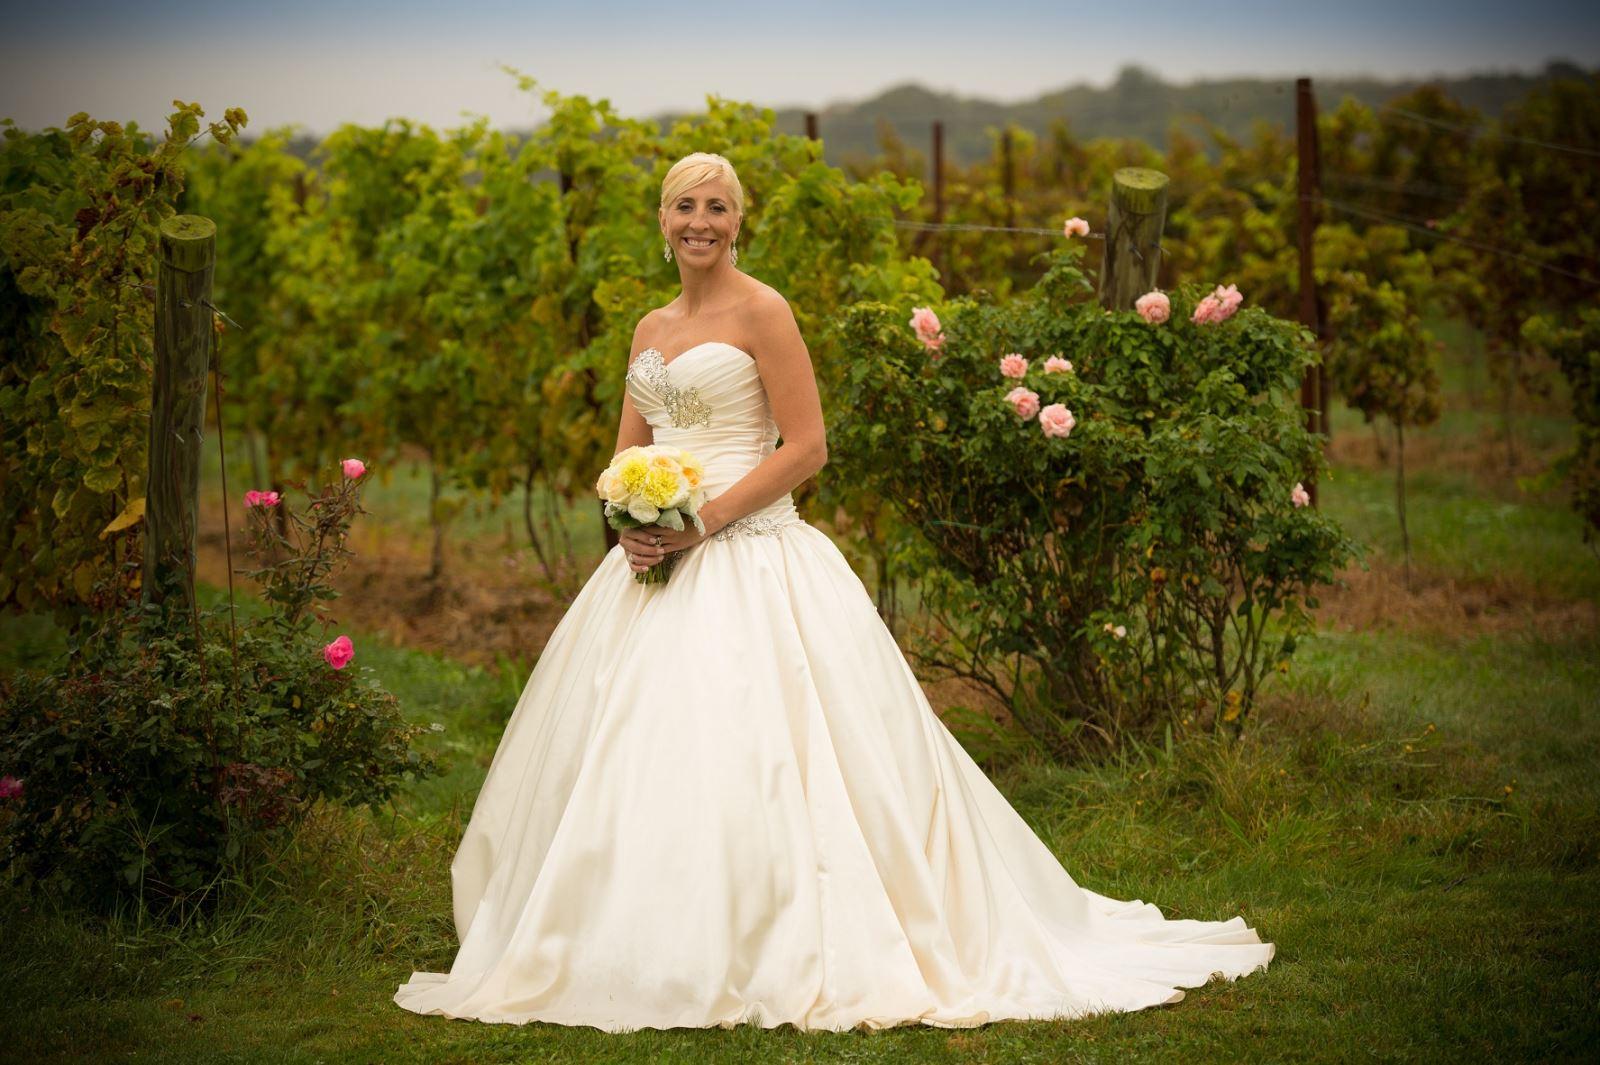 Wedding Dress In Ct.Danielle S Wedding Dress Preservation In Connecticut Wedding Gown